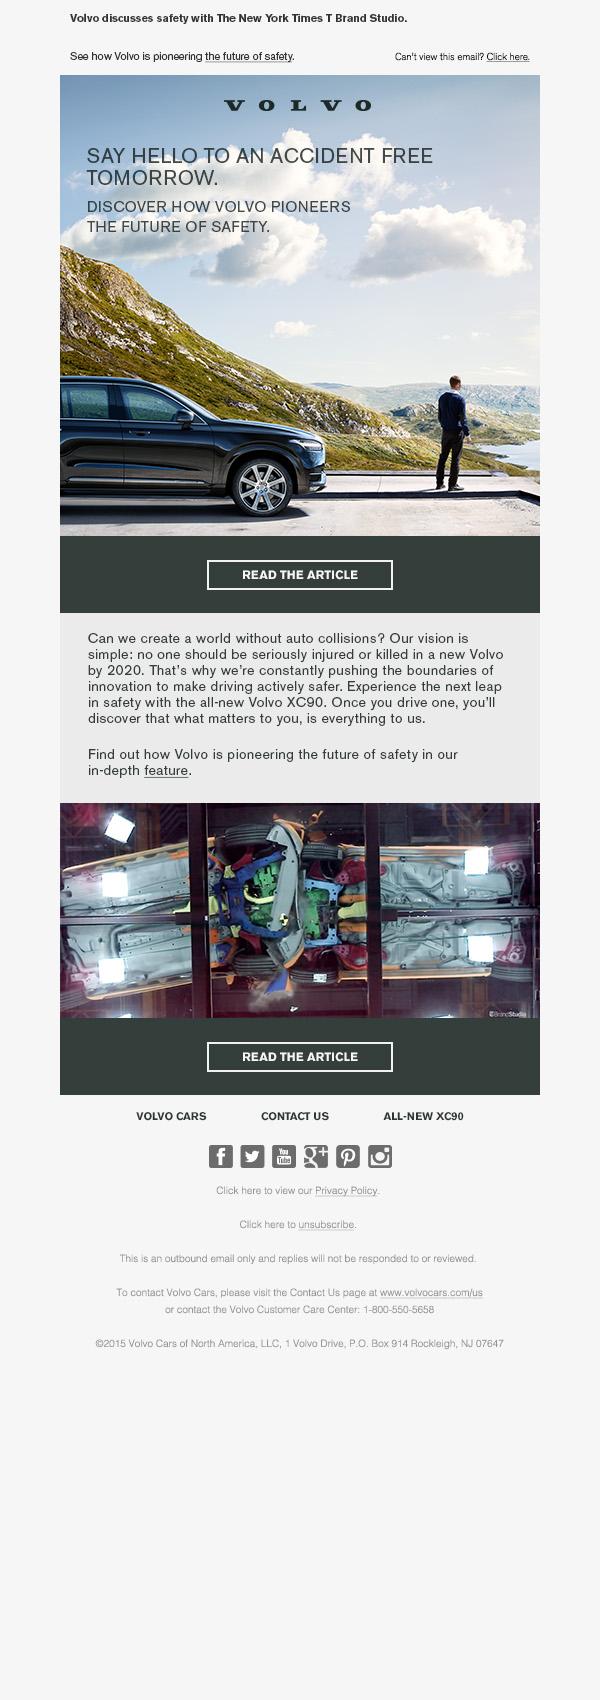 Volvo_JanEng_Safety_XC90_CRM_v11_0001_Handraisers.jpg